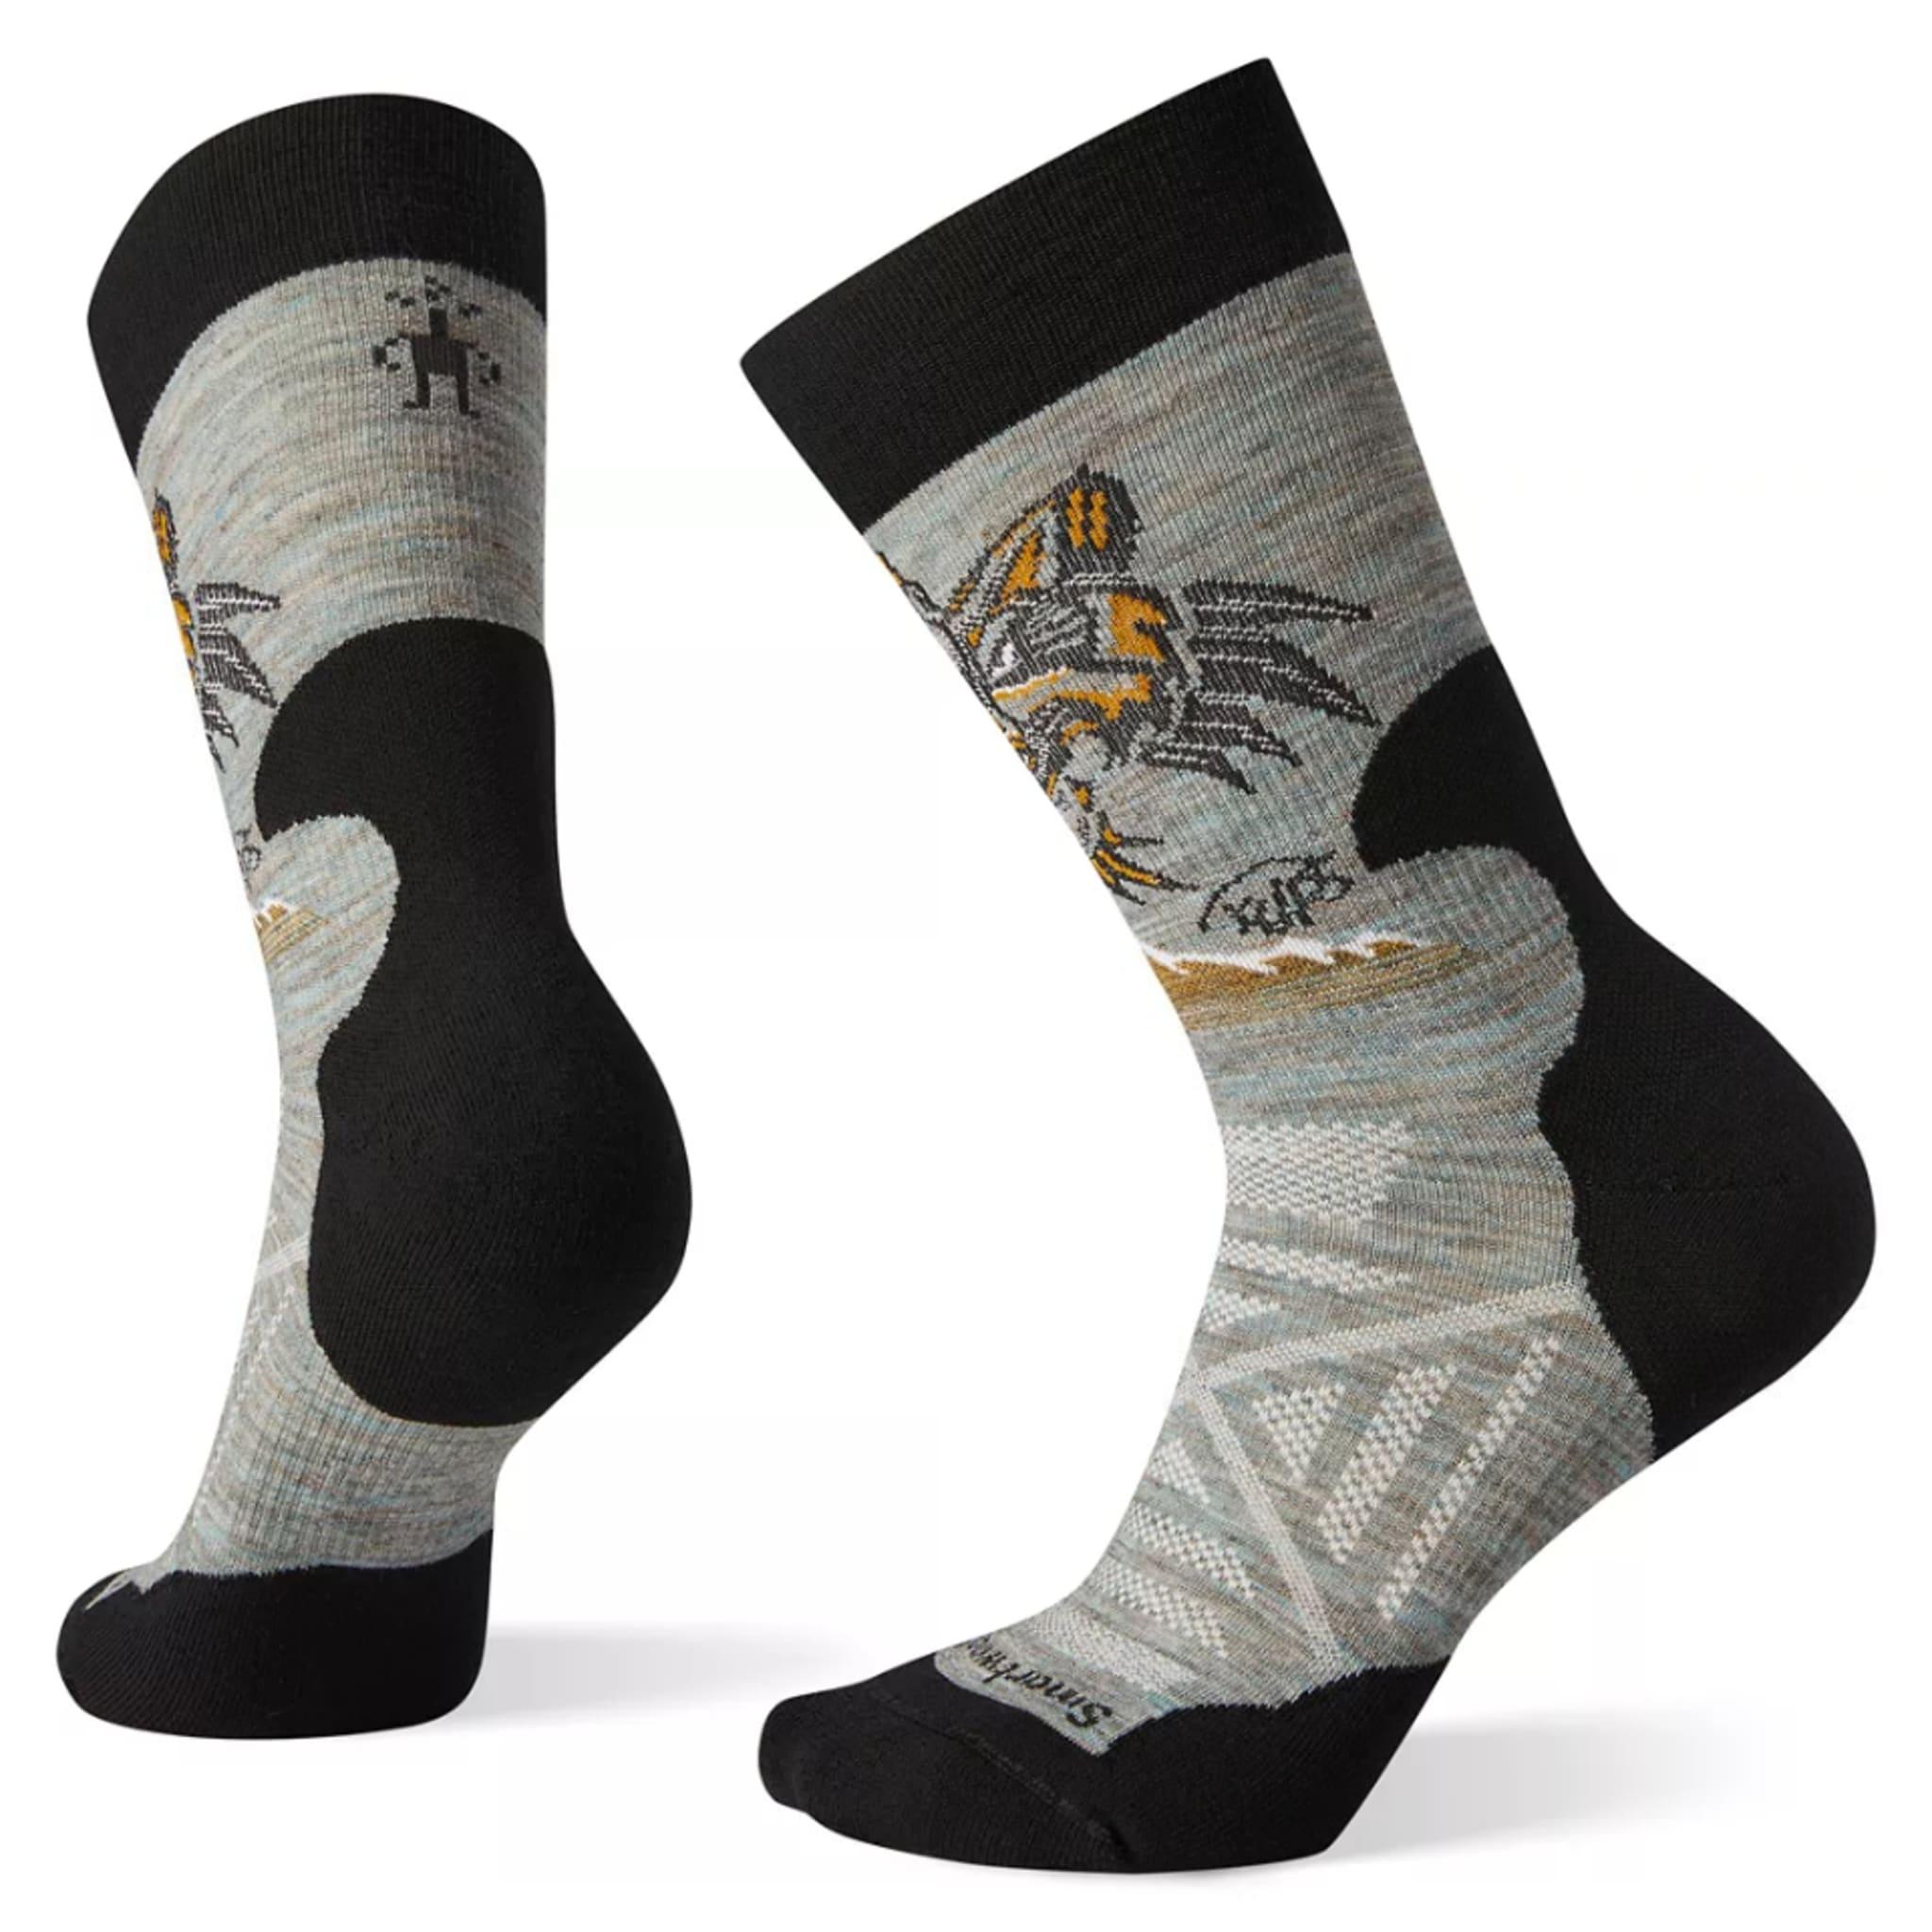 Hiking sokk i sprekt design